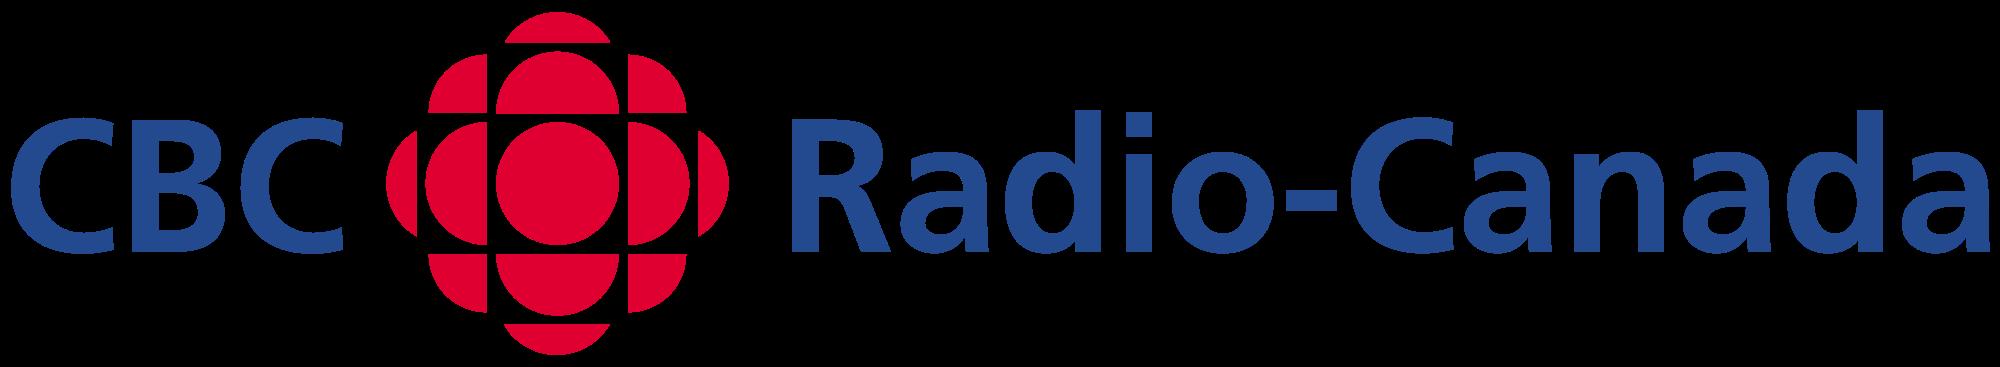 15-CBC-Radio-Canada.png